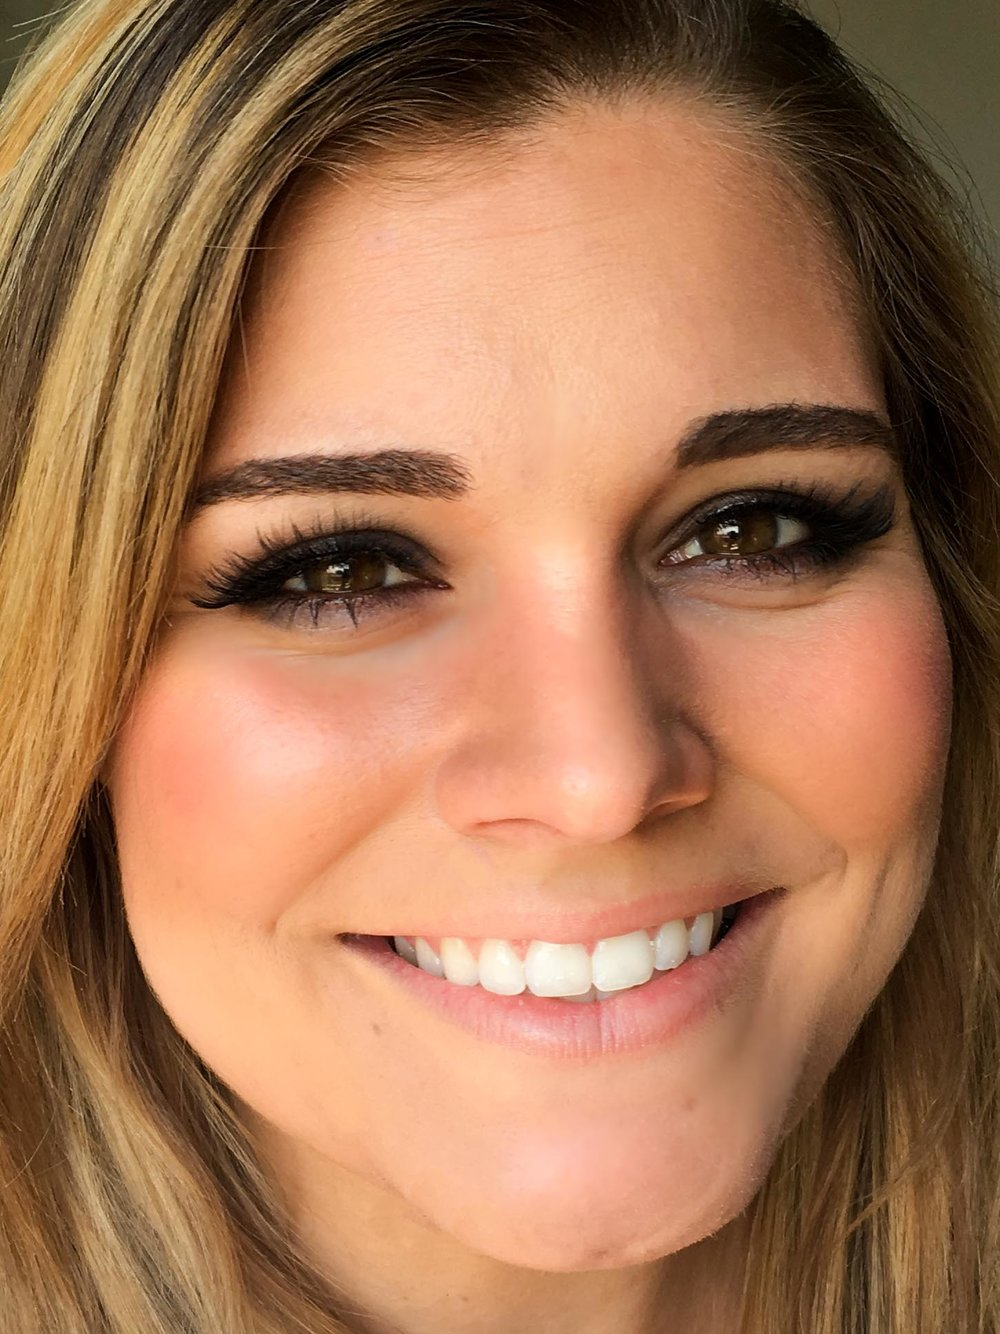 Talia-Whatcott-Makeup-Hair-Artist-Utah-County-makeup-for-ever-artist-face-color-palette-review8.jpg